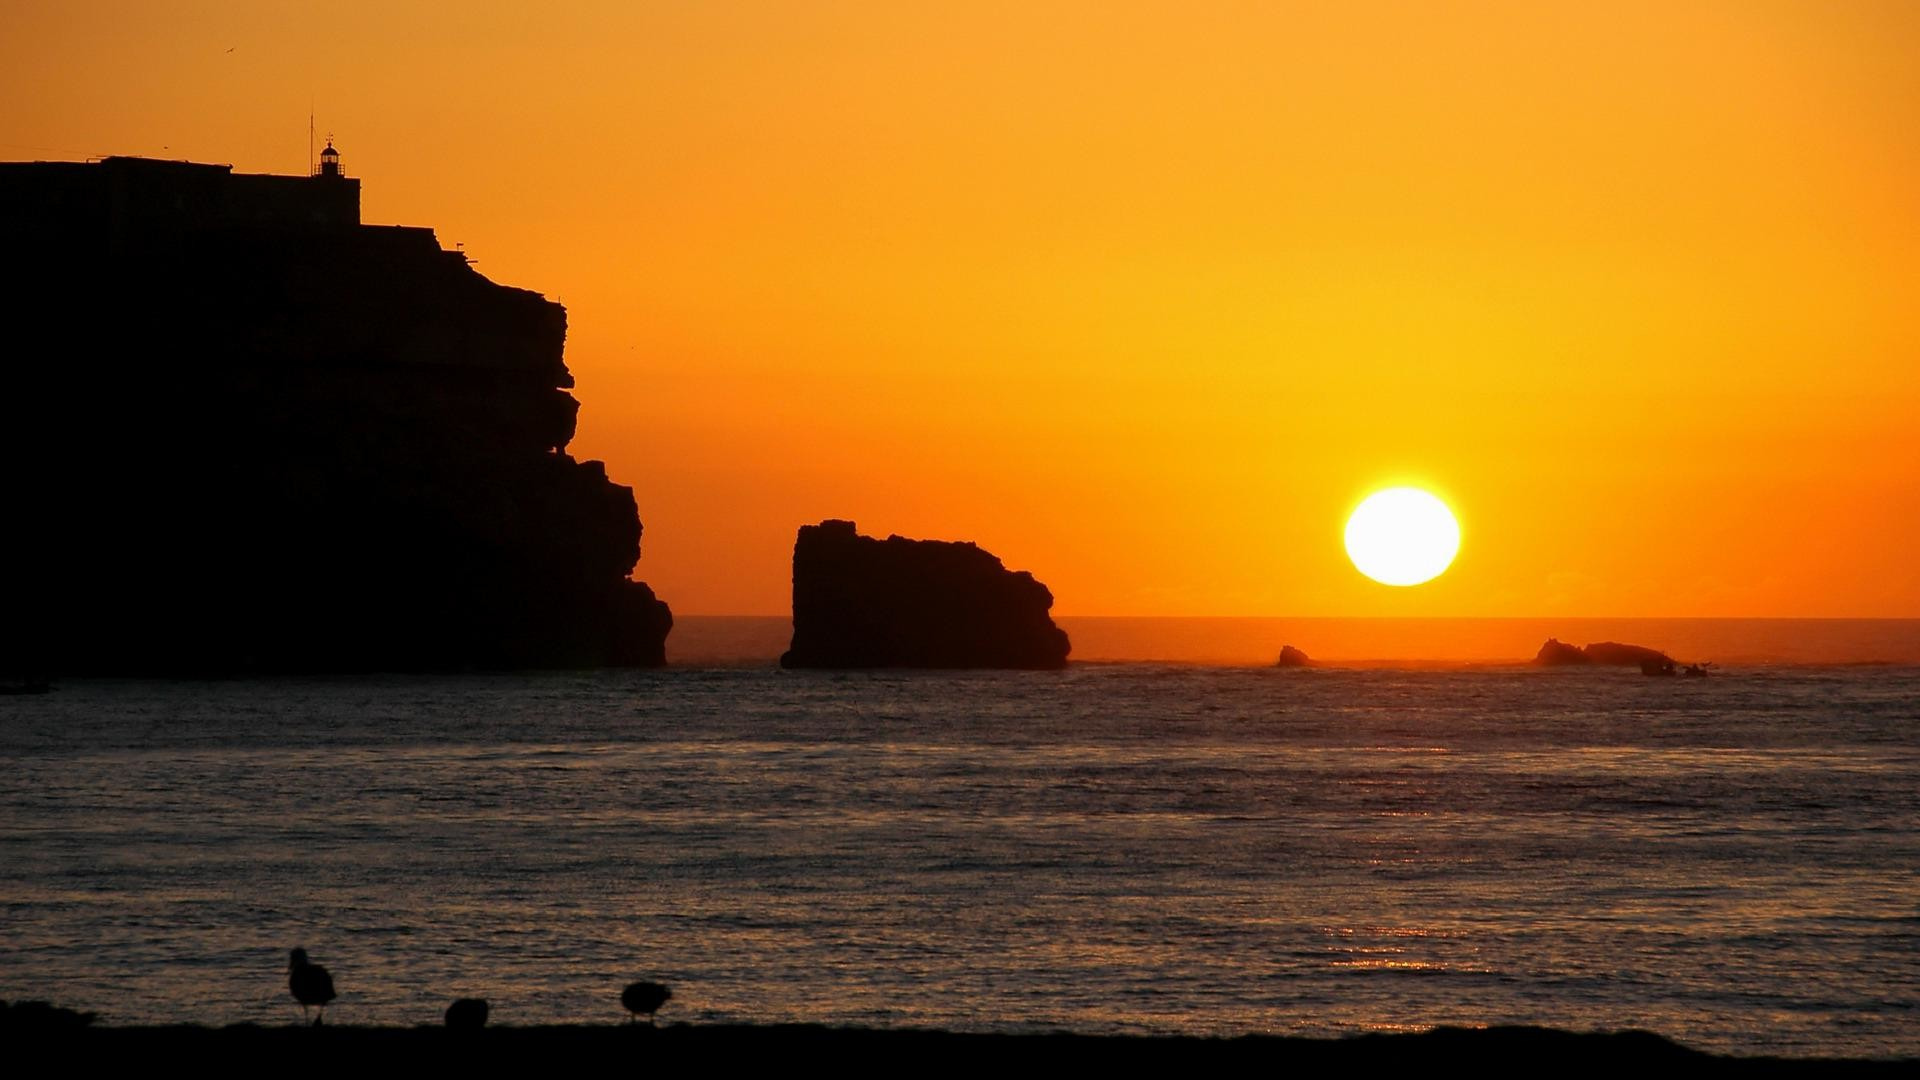 wallpaper.wiki-Sunrise-on-the-beach-hd-beach-